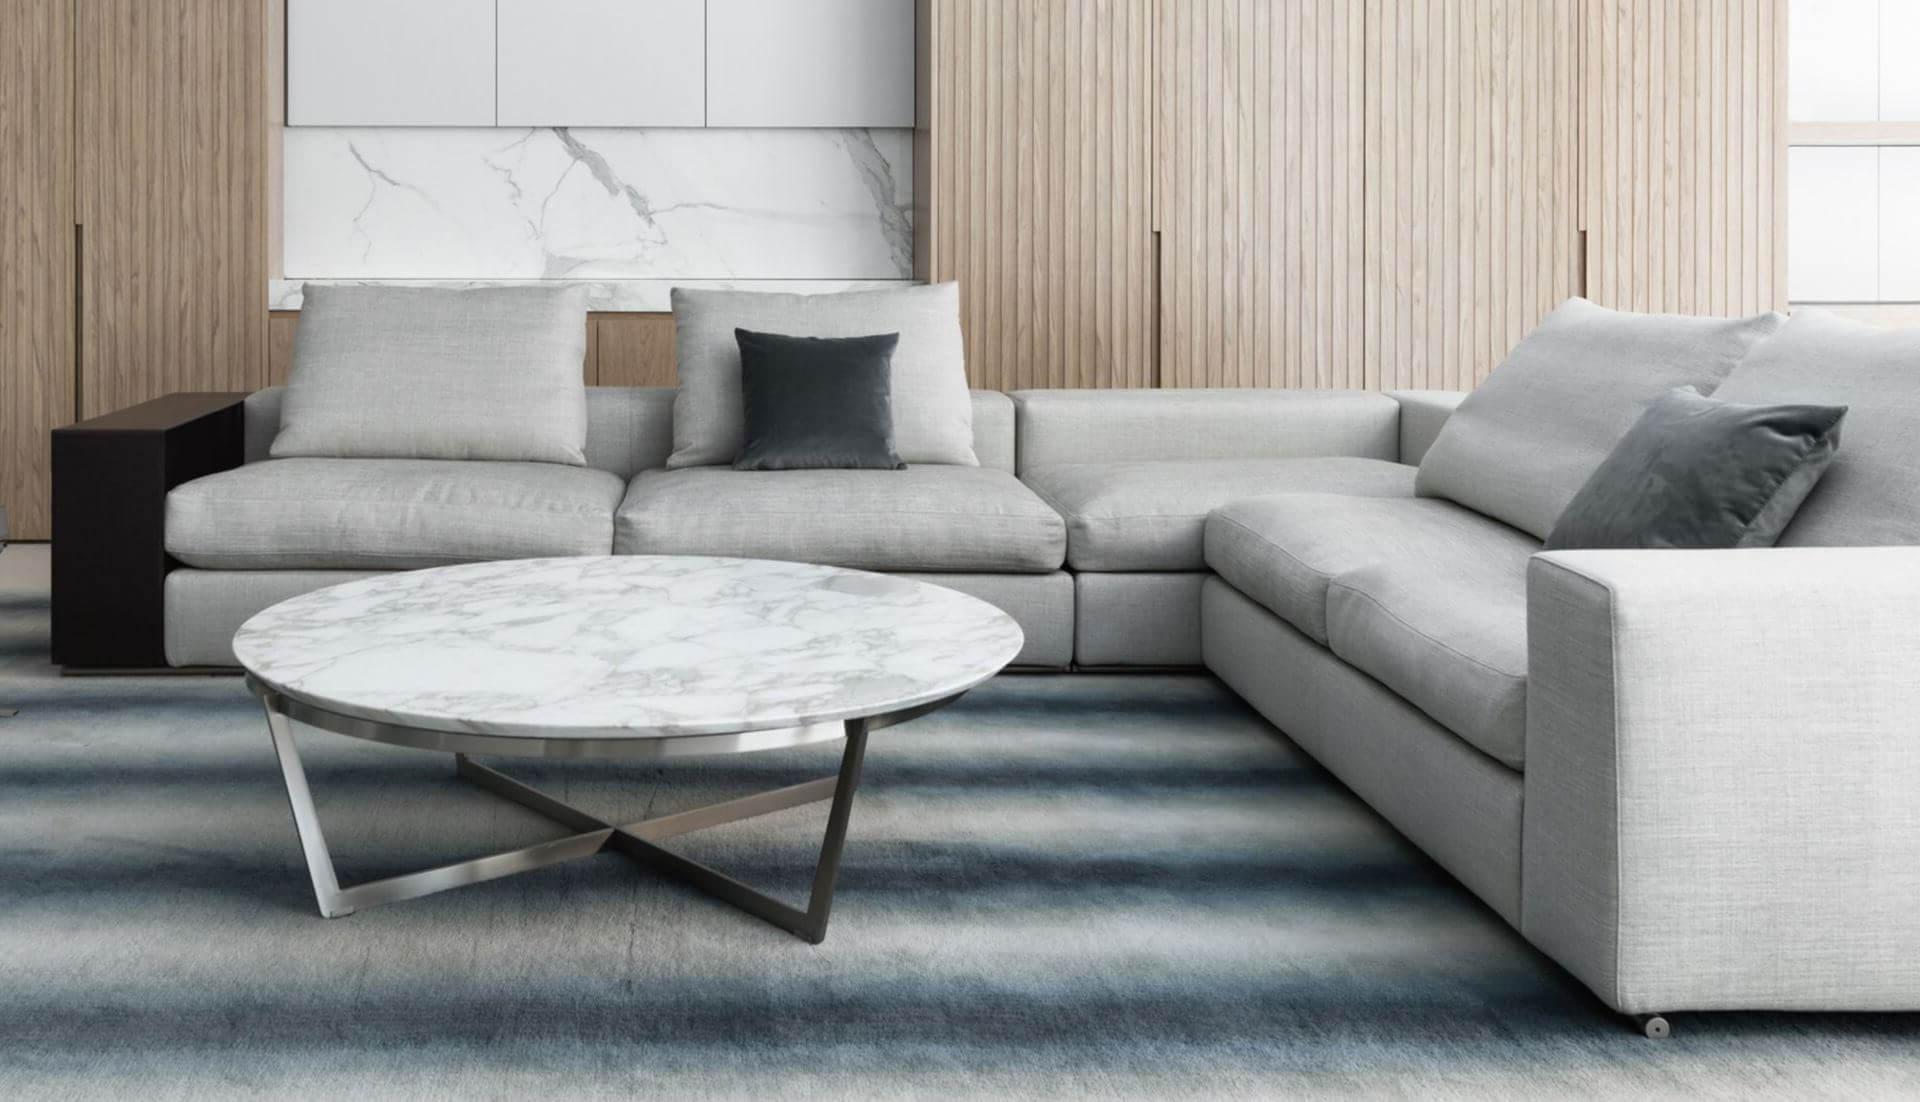 Dream Navy 2 Piece Modular Sofas With Regard To 2018 Flexform Groundpiece Modular Sofa – Dream Design Interiors Ltd (View 4 of 20)